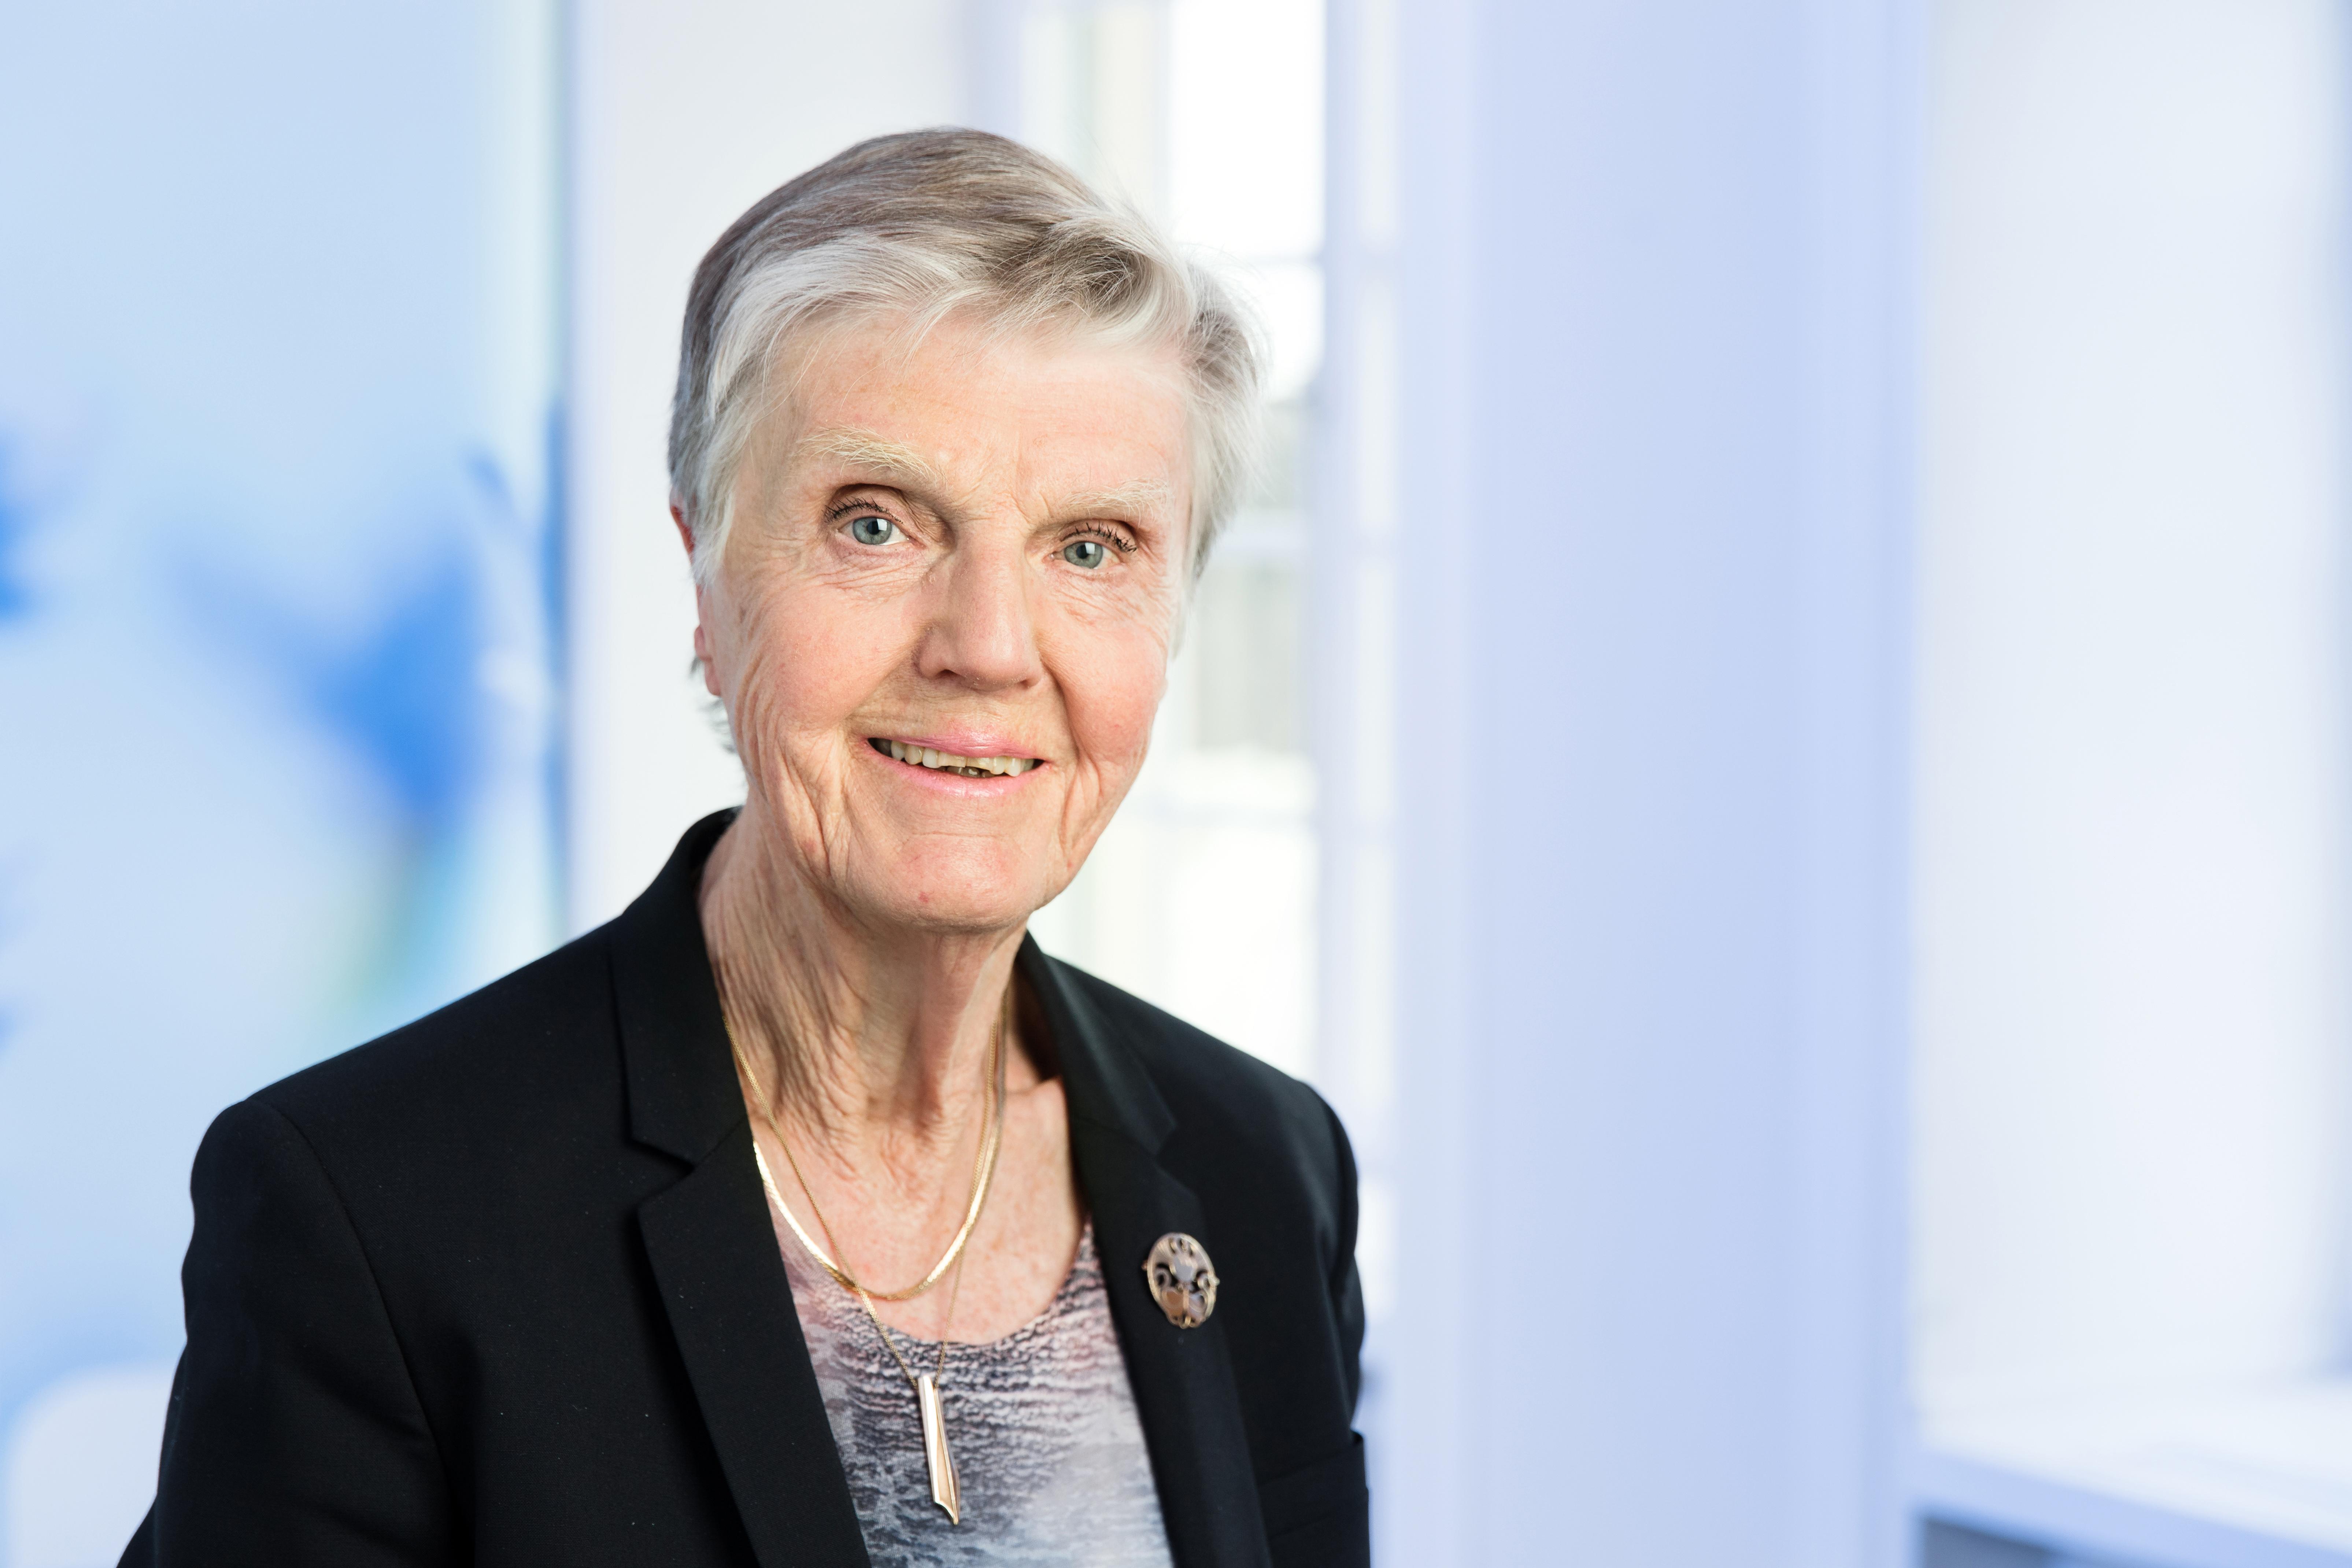 Meet human rights champion Barbro Westerholm